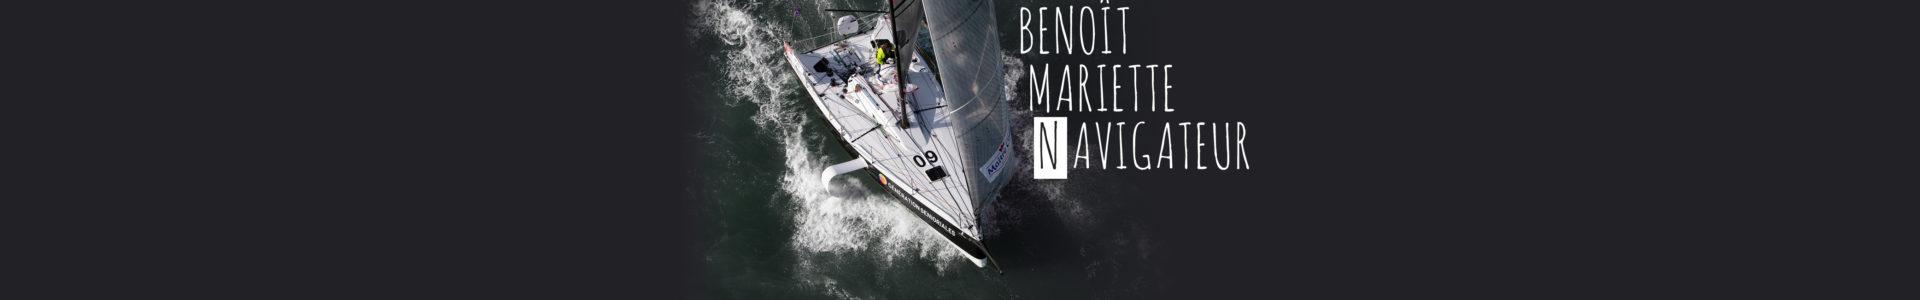 Benoît MARIETTE - Navigateur